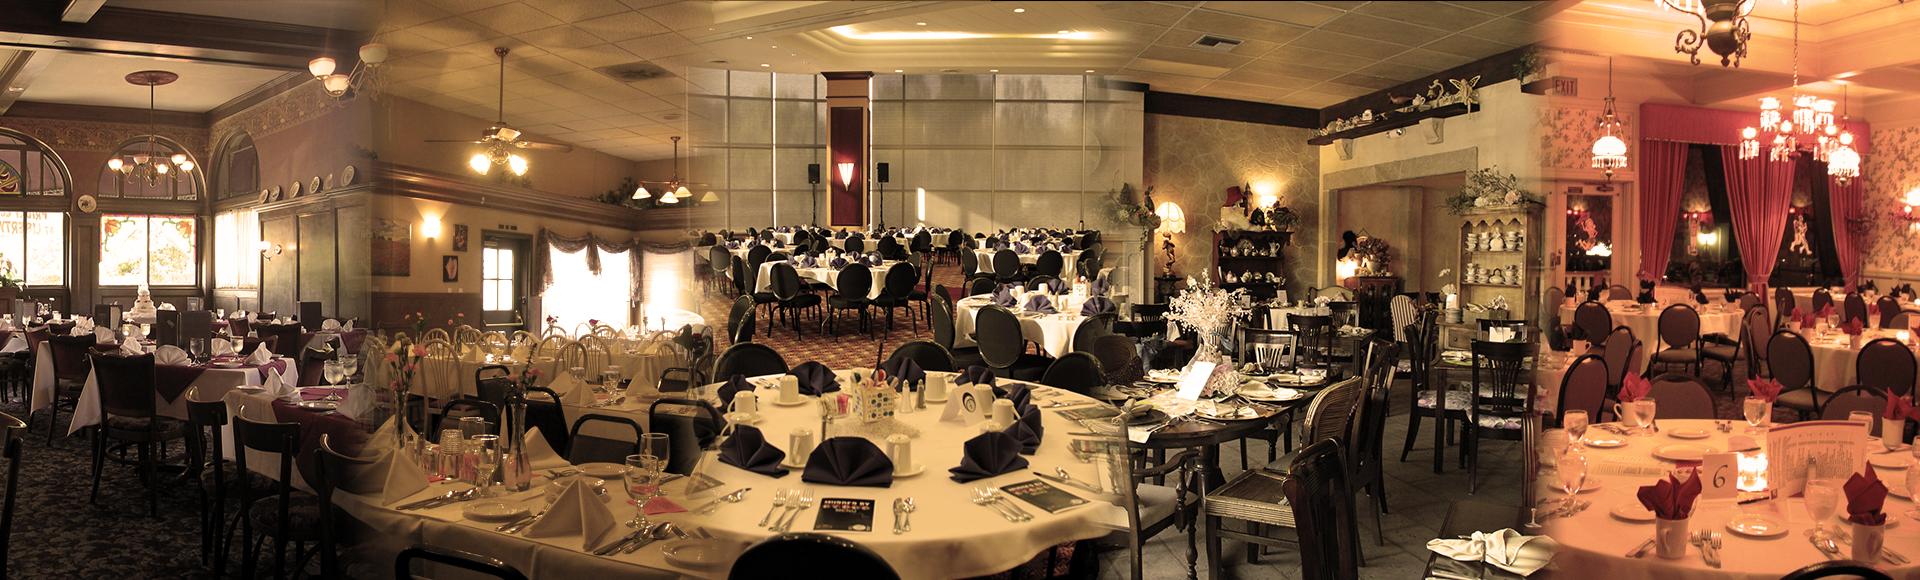 GibsonHouse Murder Mystery Dinner Theatre!